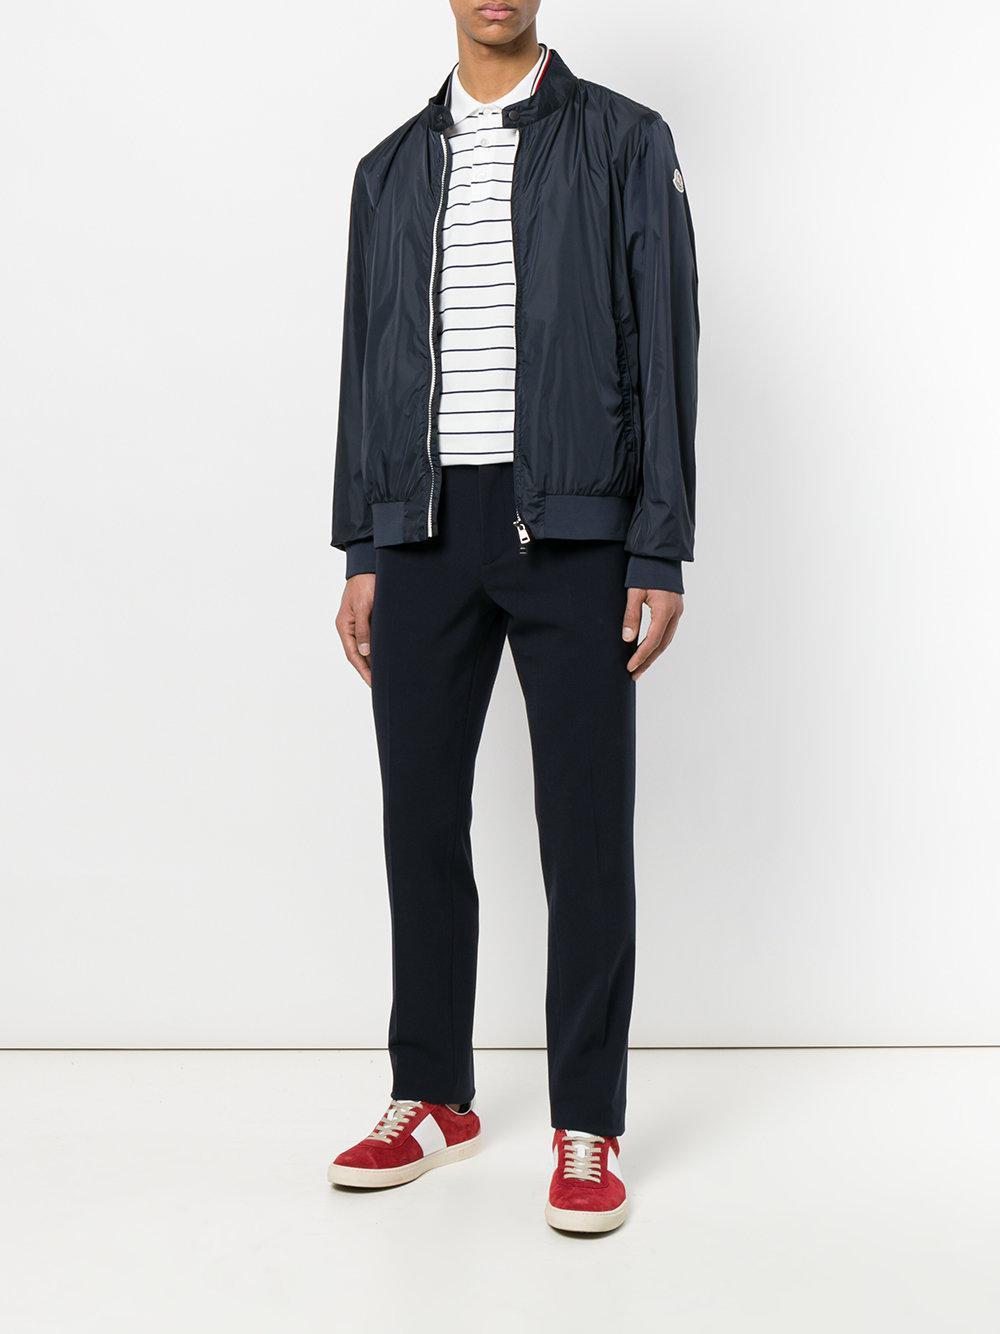 Moncler Lightweight Zip Jacket in Blue for Men